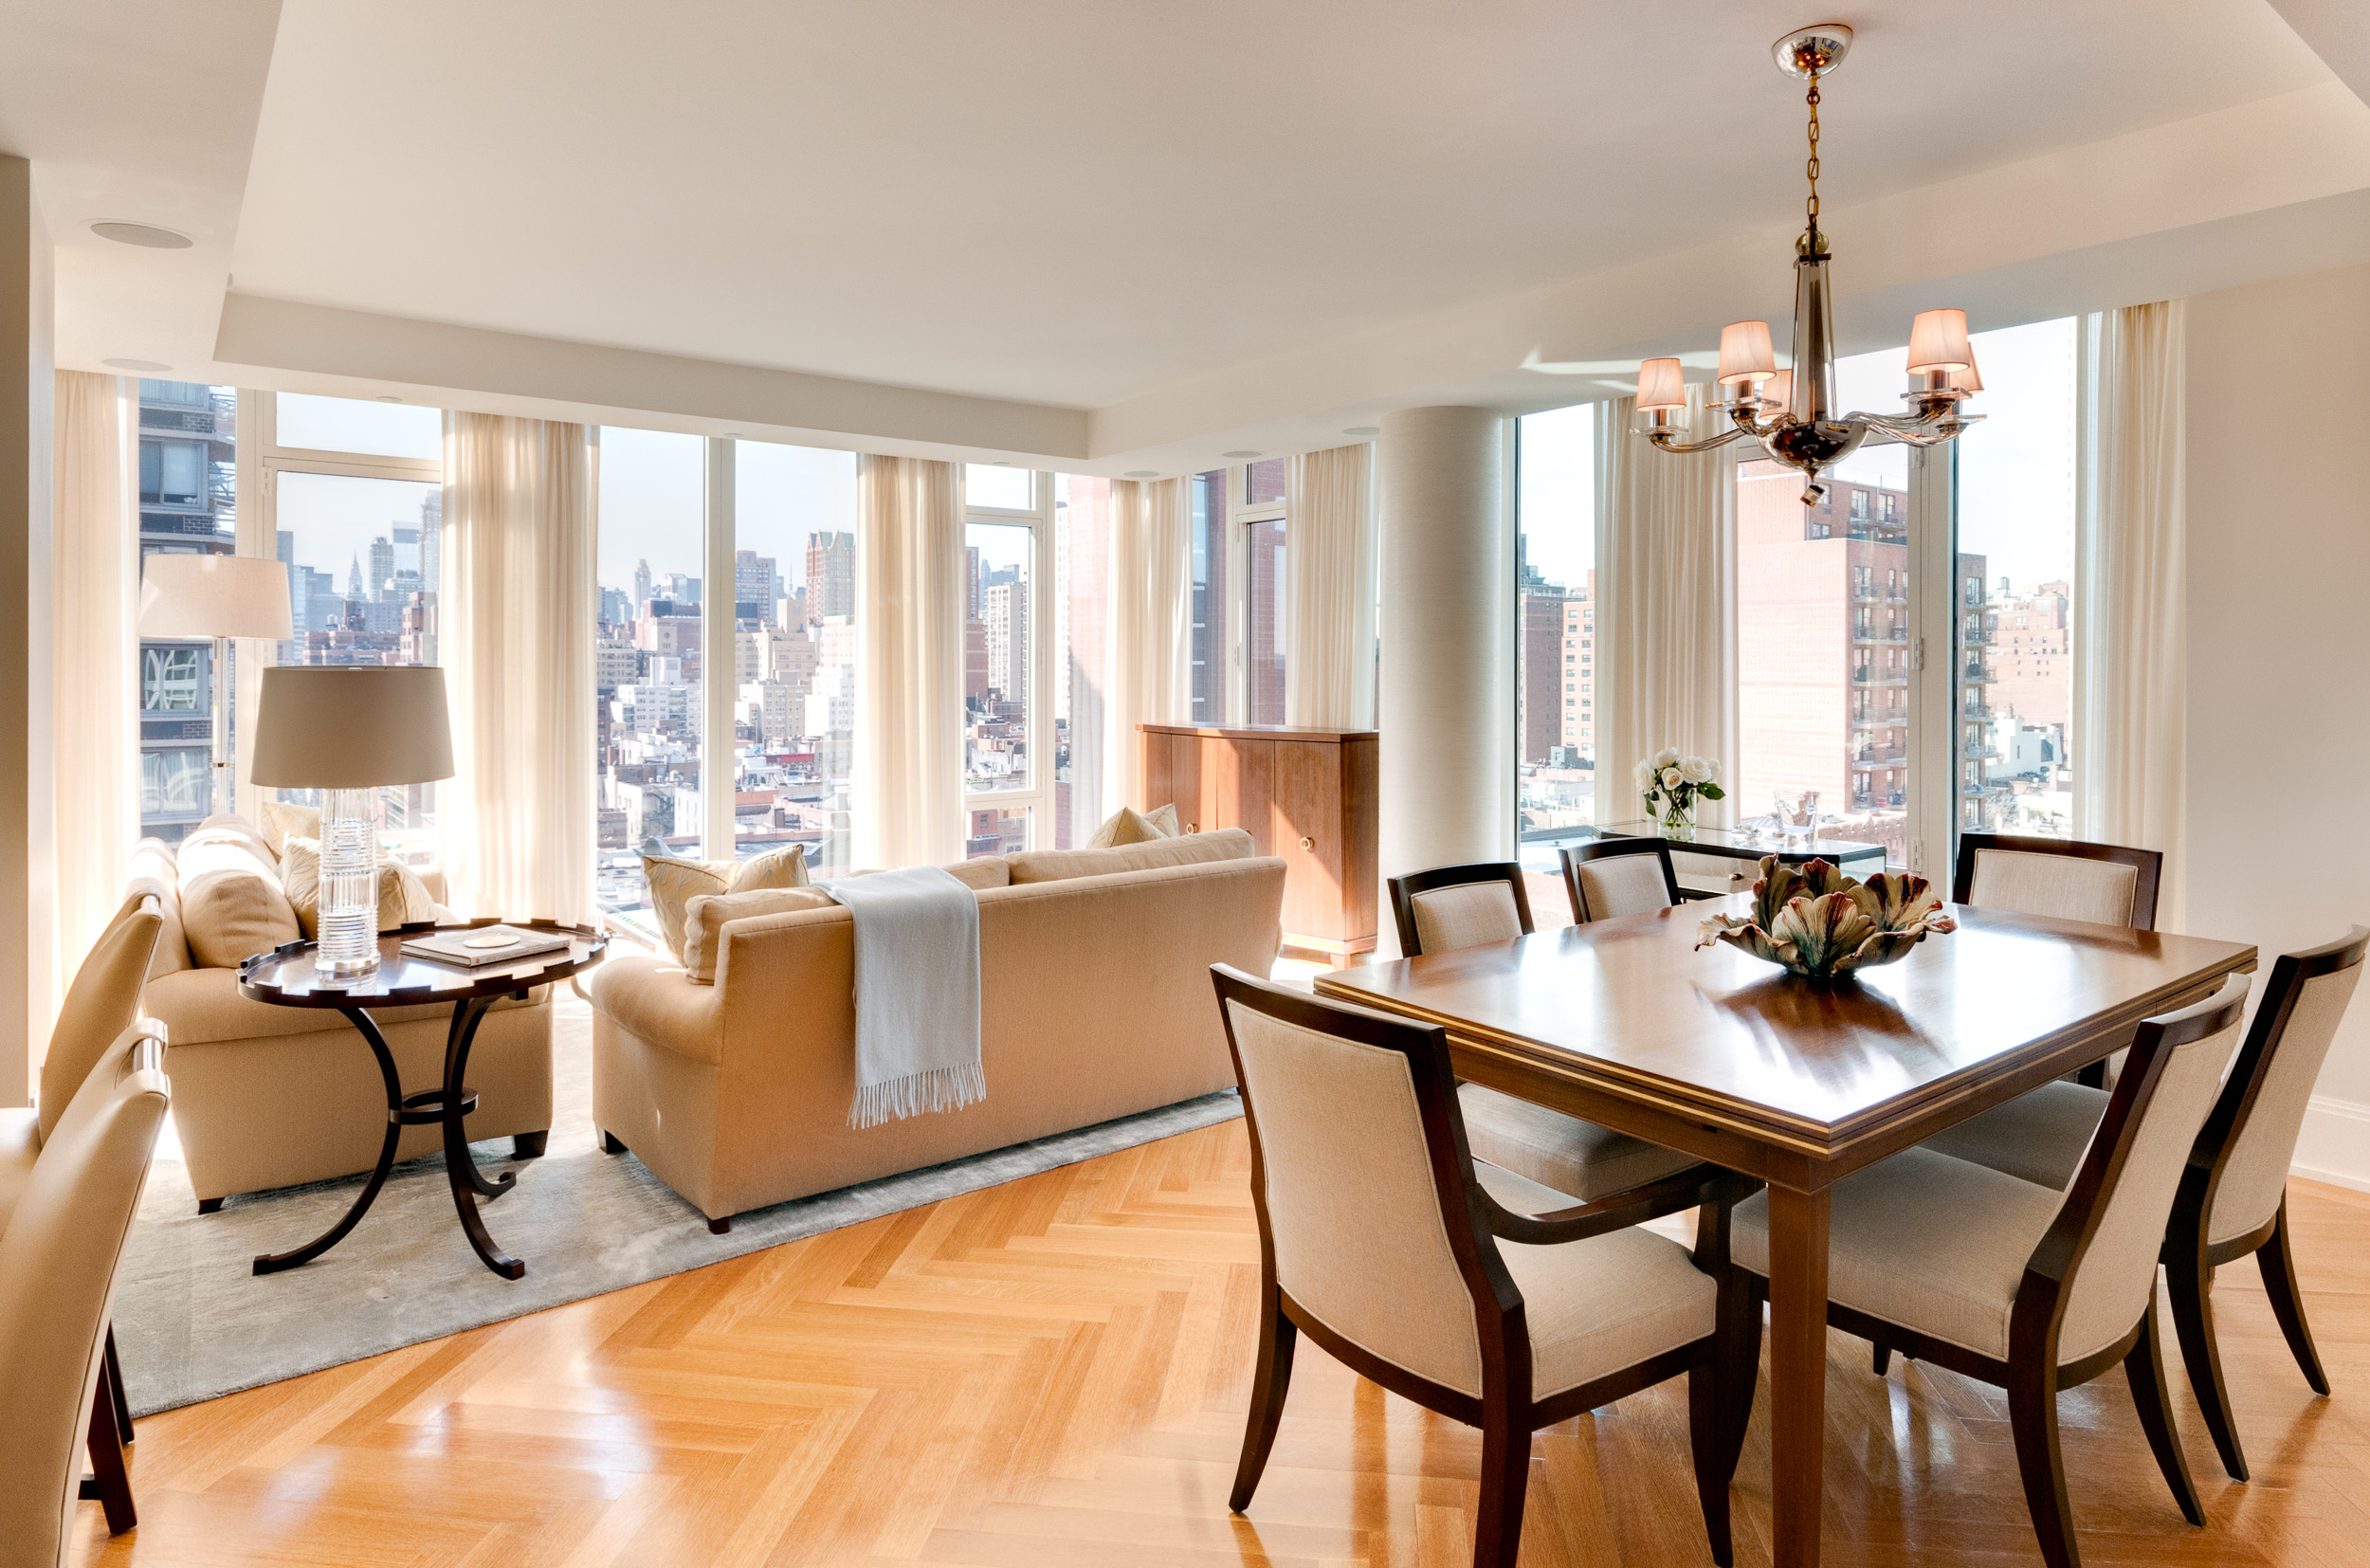 Living-Room-Dining-Amy-Seminski-Interior-Design-Scott-Larsen.jpg